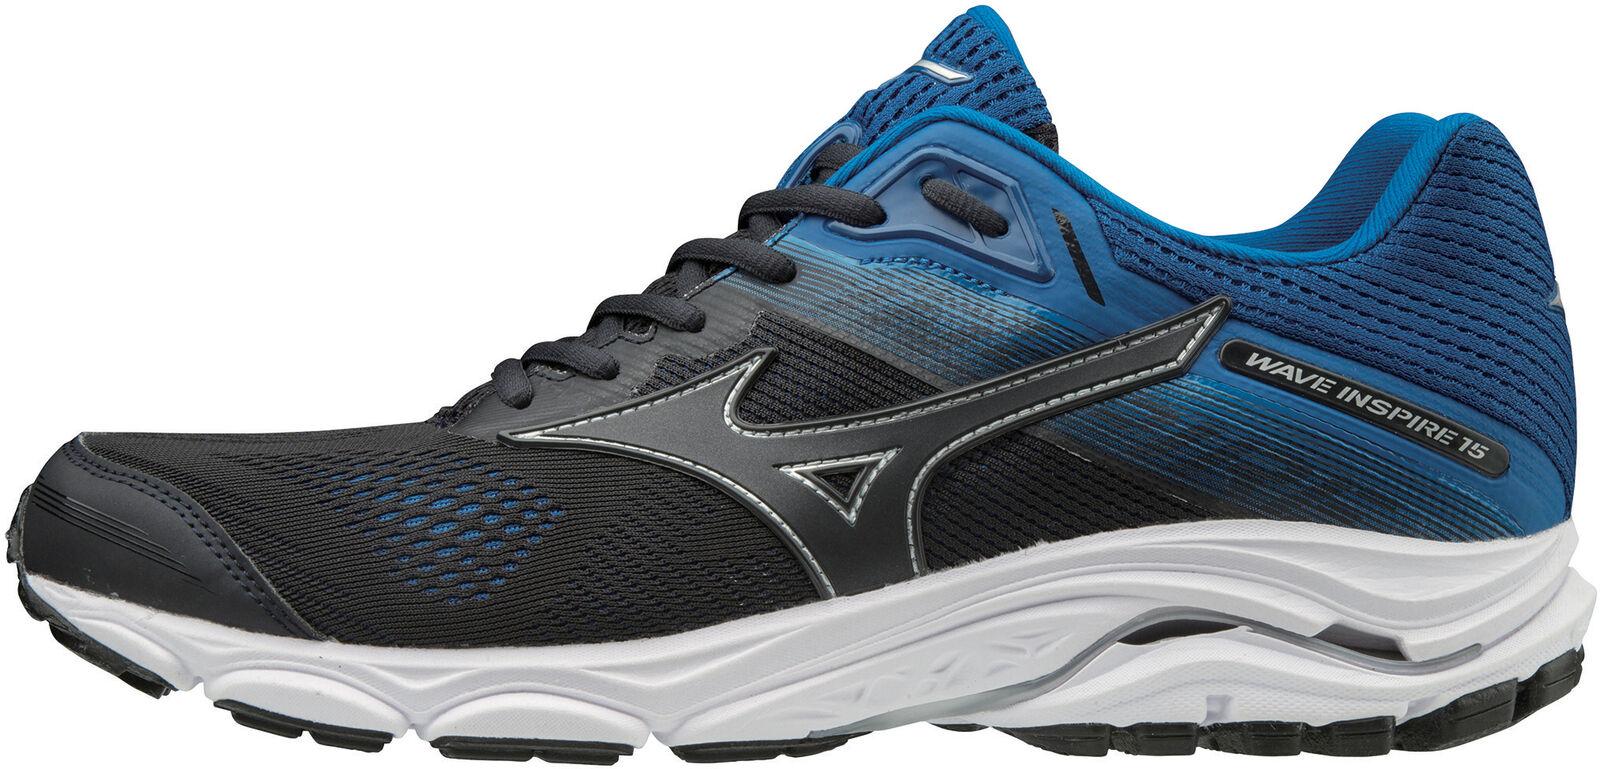 Mizuno Wave Inspire 15 mannenu's hardlopen schoenen --zwart